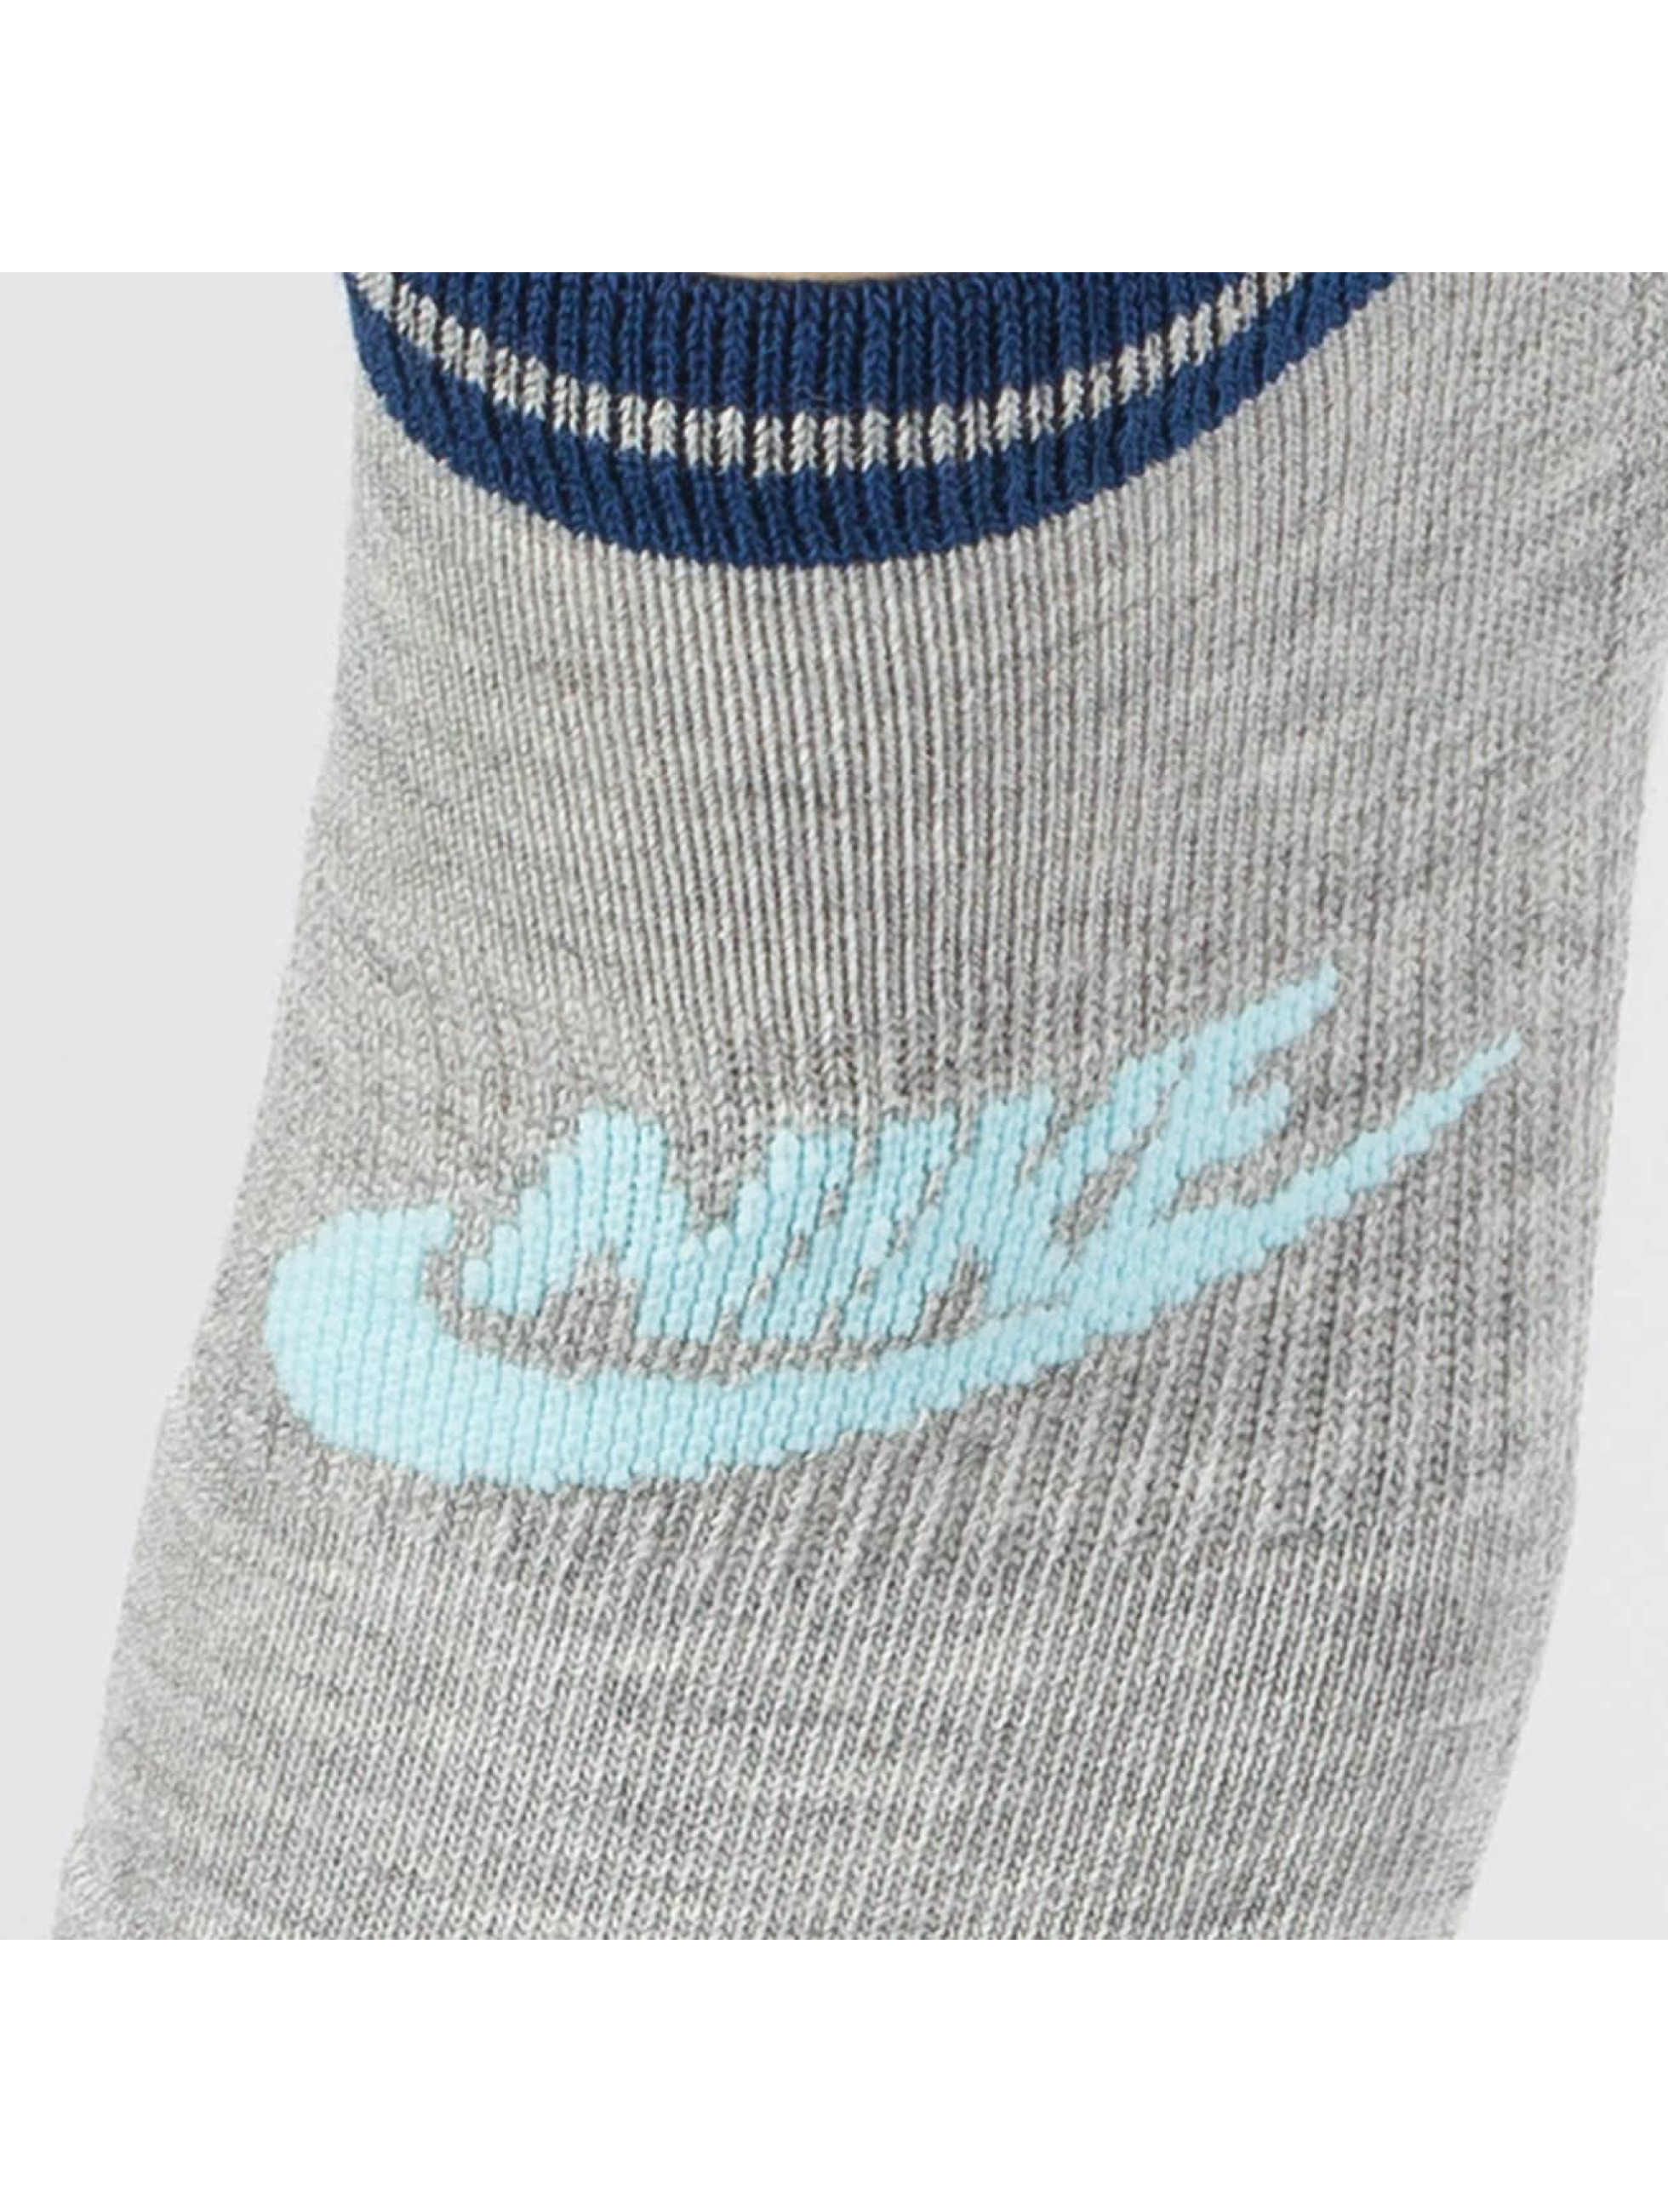 Nike Socks Sportswear No Show blue